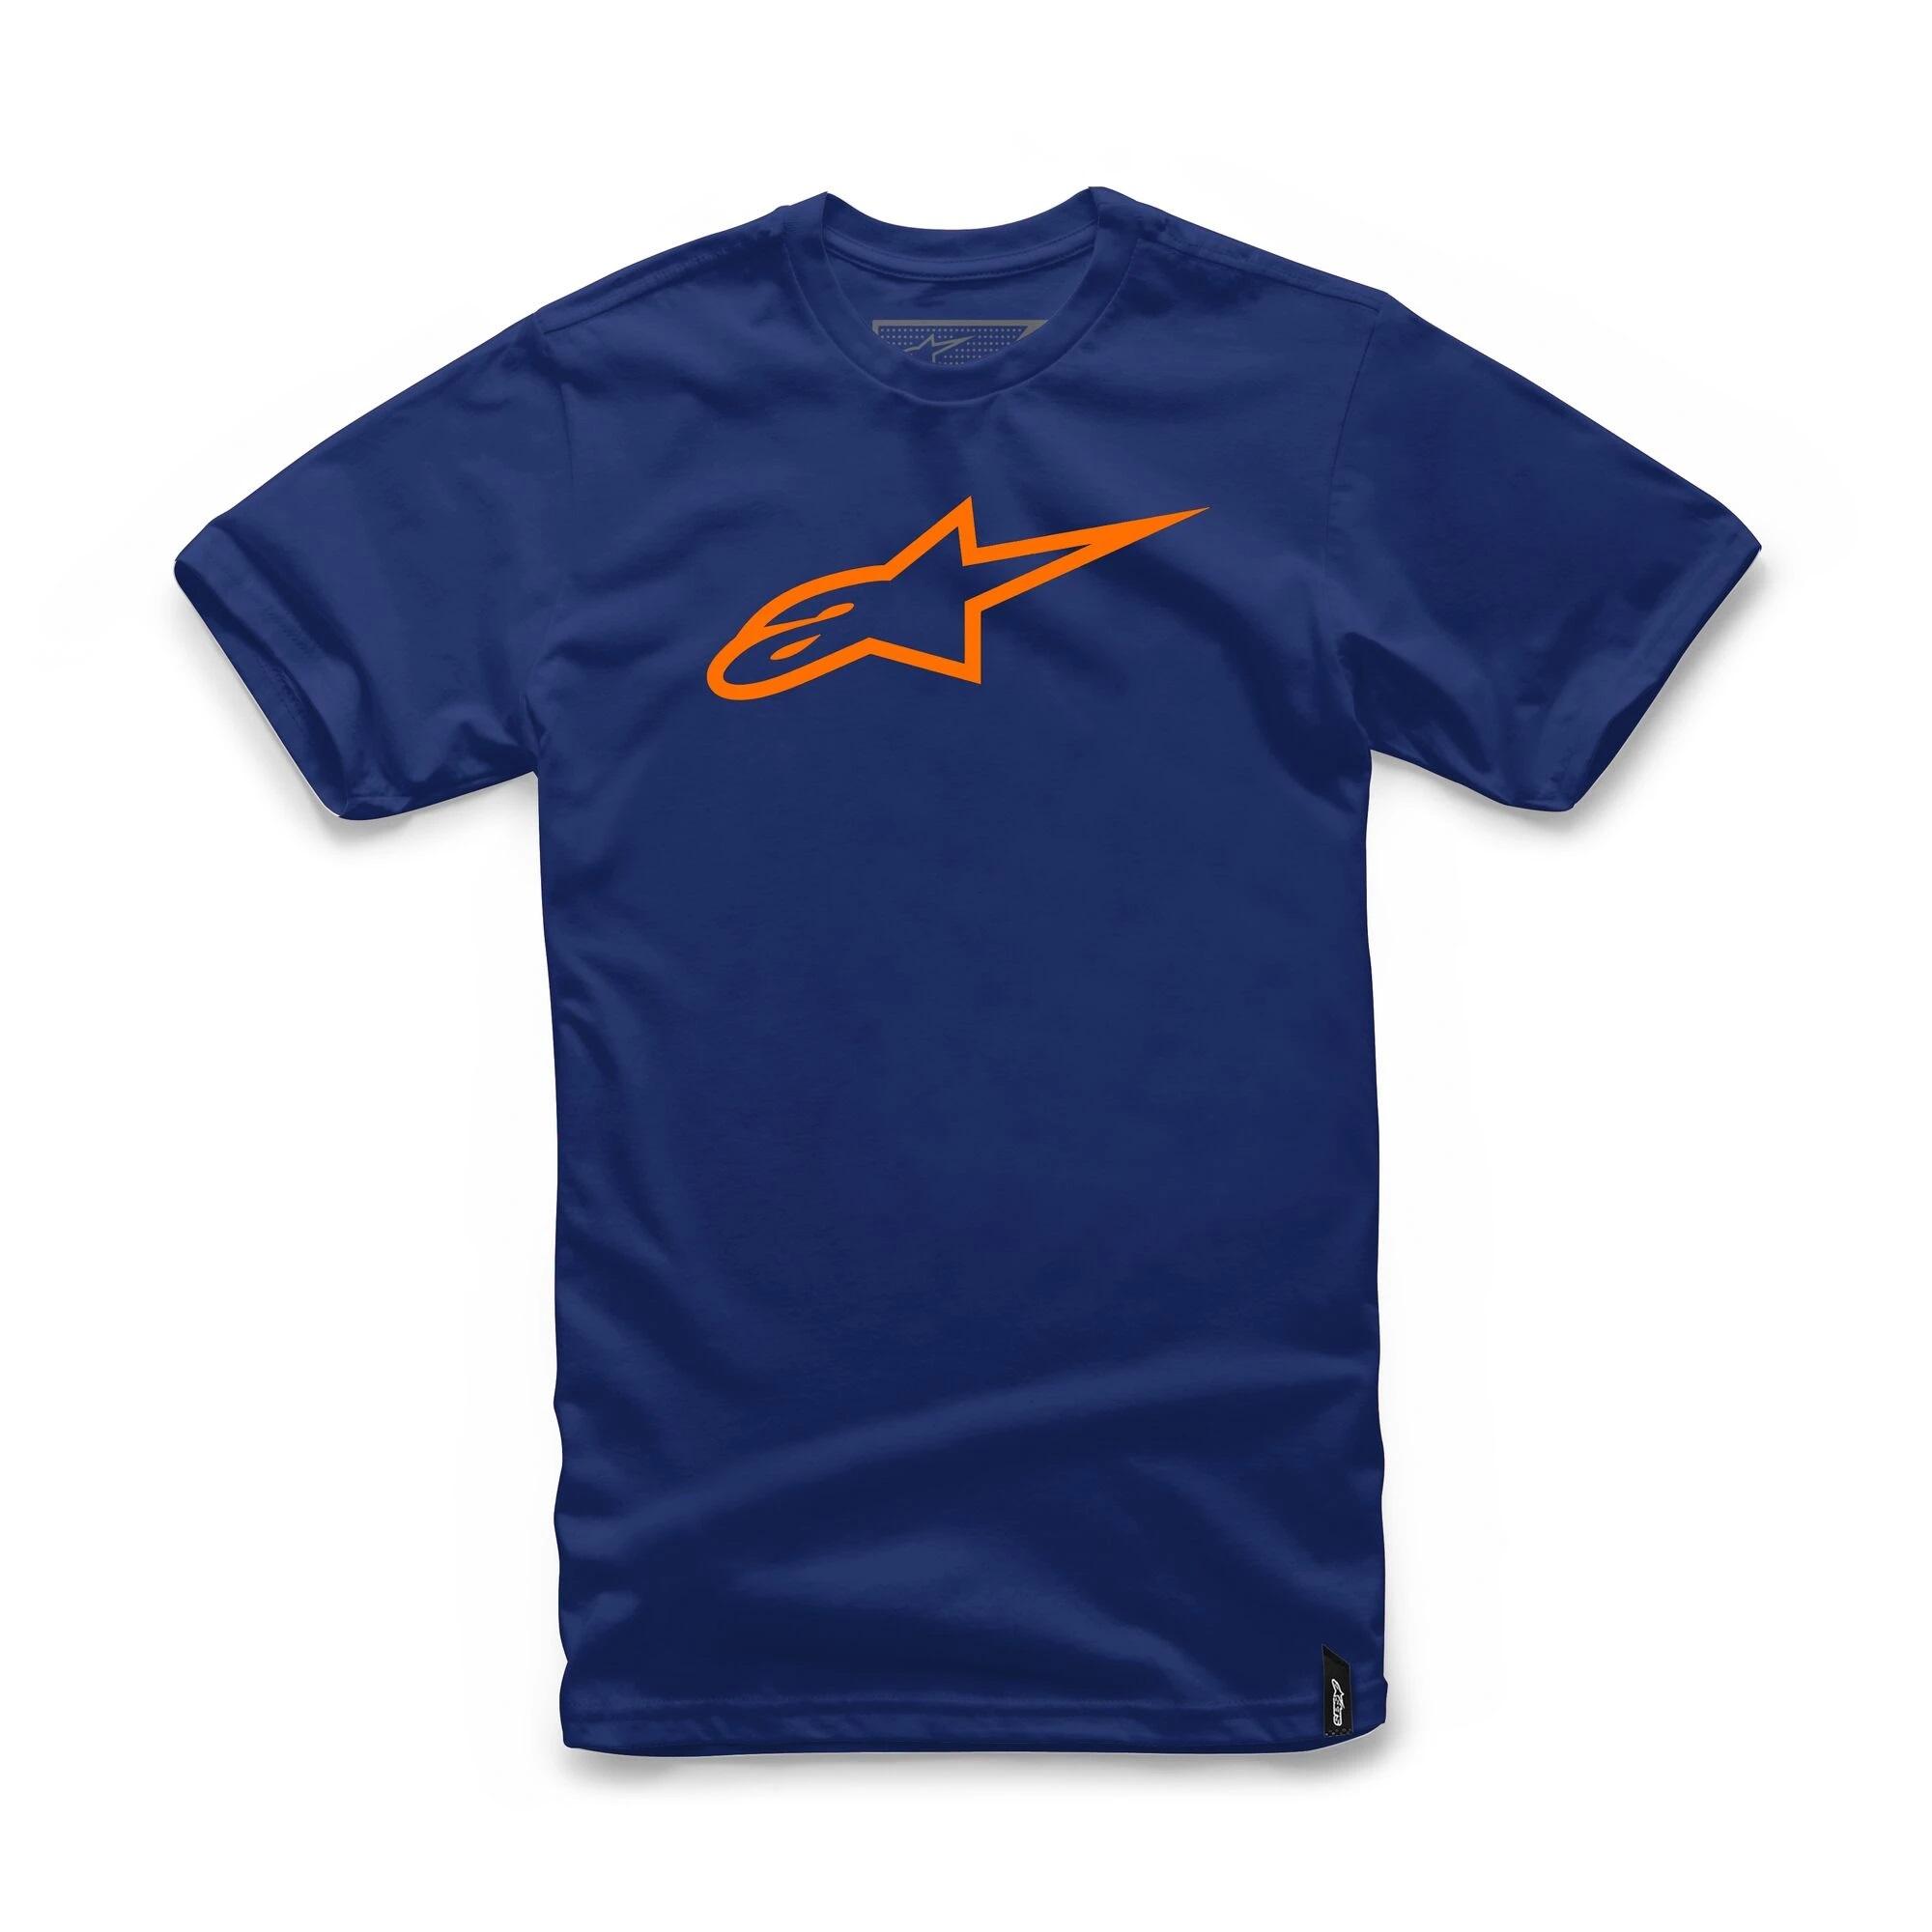 Alpinestars Ageless Classic Navy/Orange T-Shirt